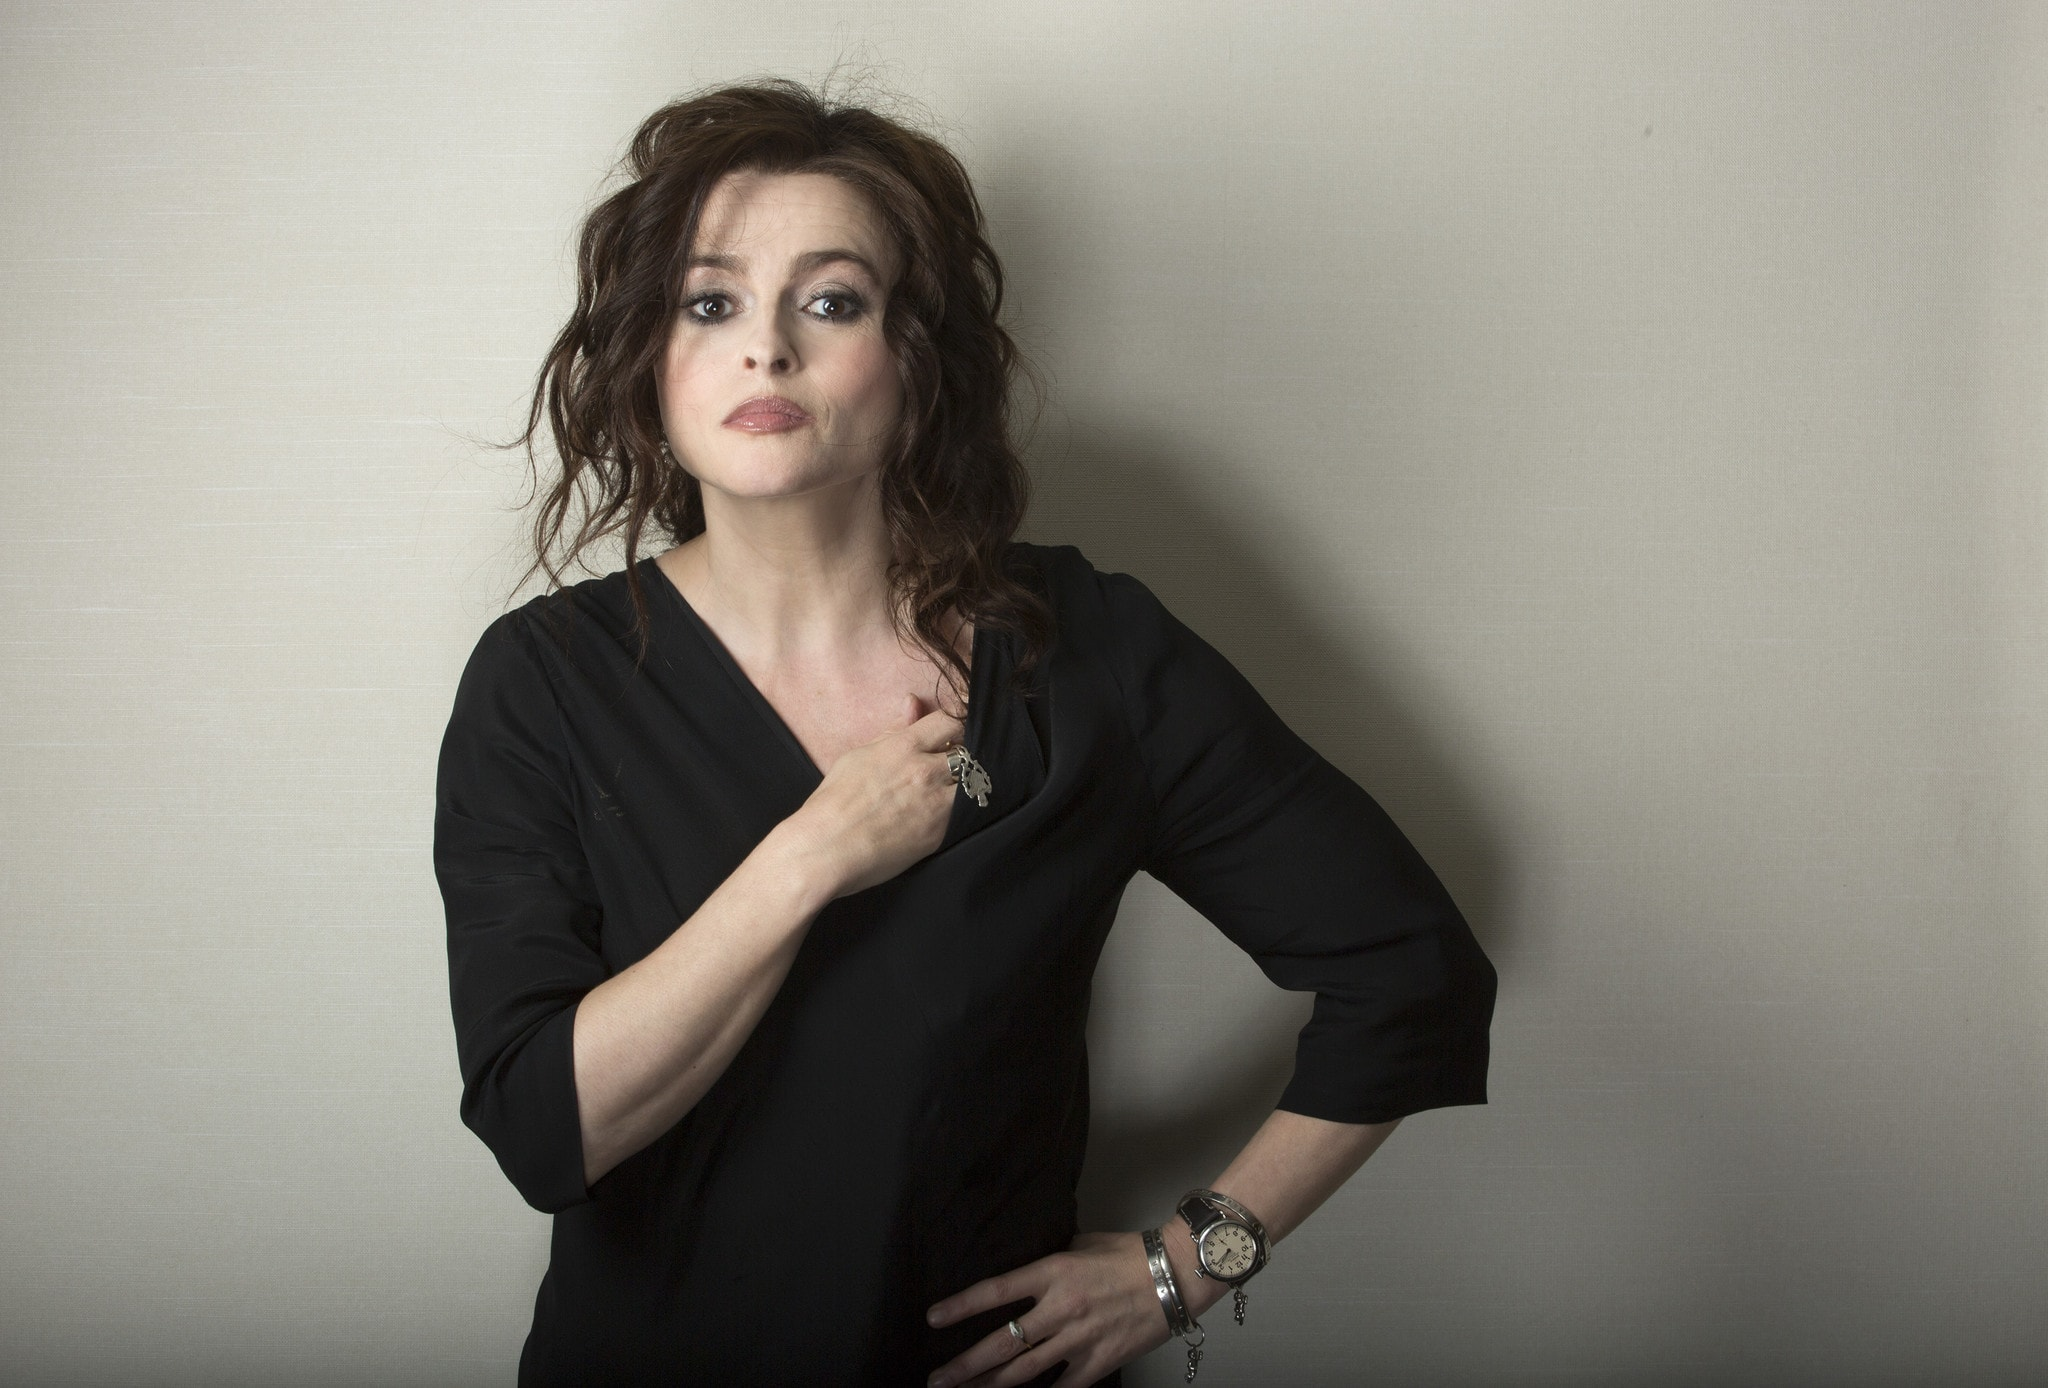 Helena Bonham Carter Full hd wallpapers